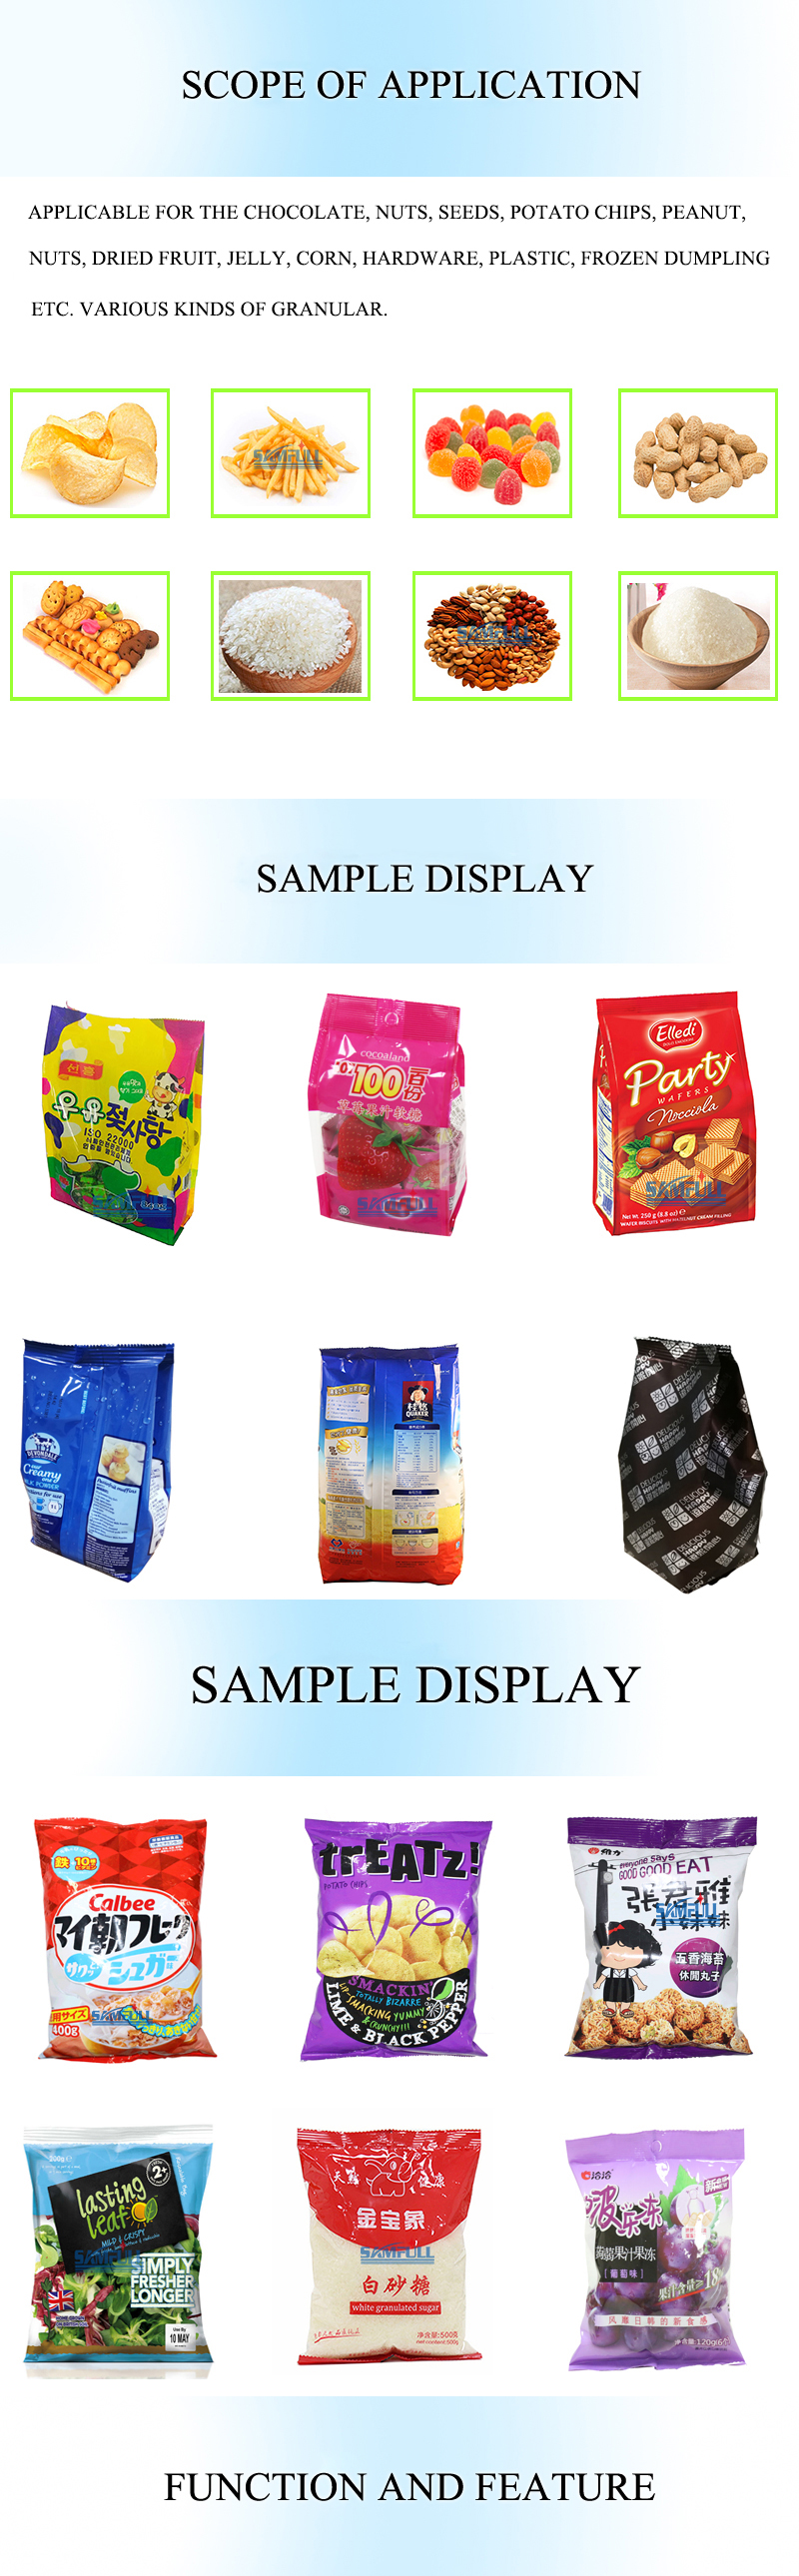 Nitrogen Packing Mesin untuk Makanan/Kering Durian/Keripik Pita/Jamur/Popcorn